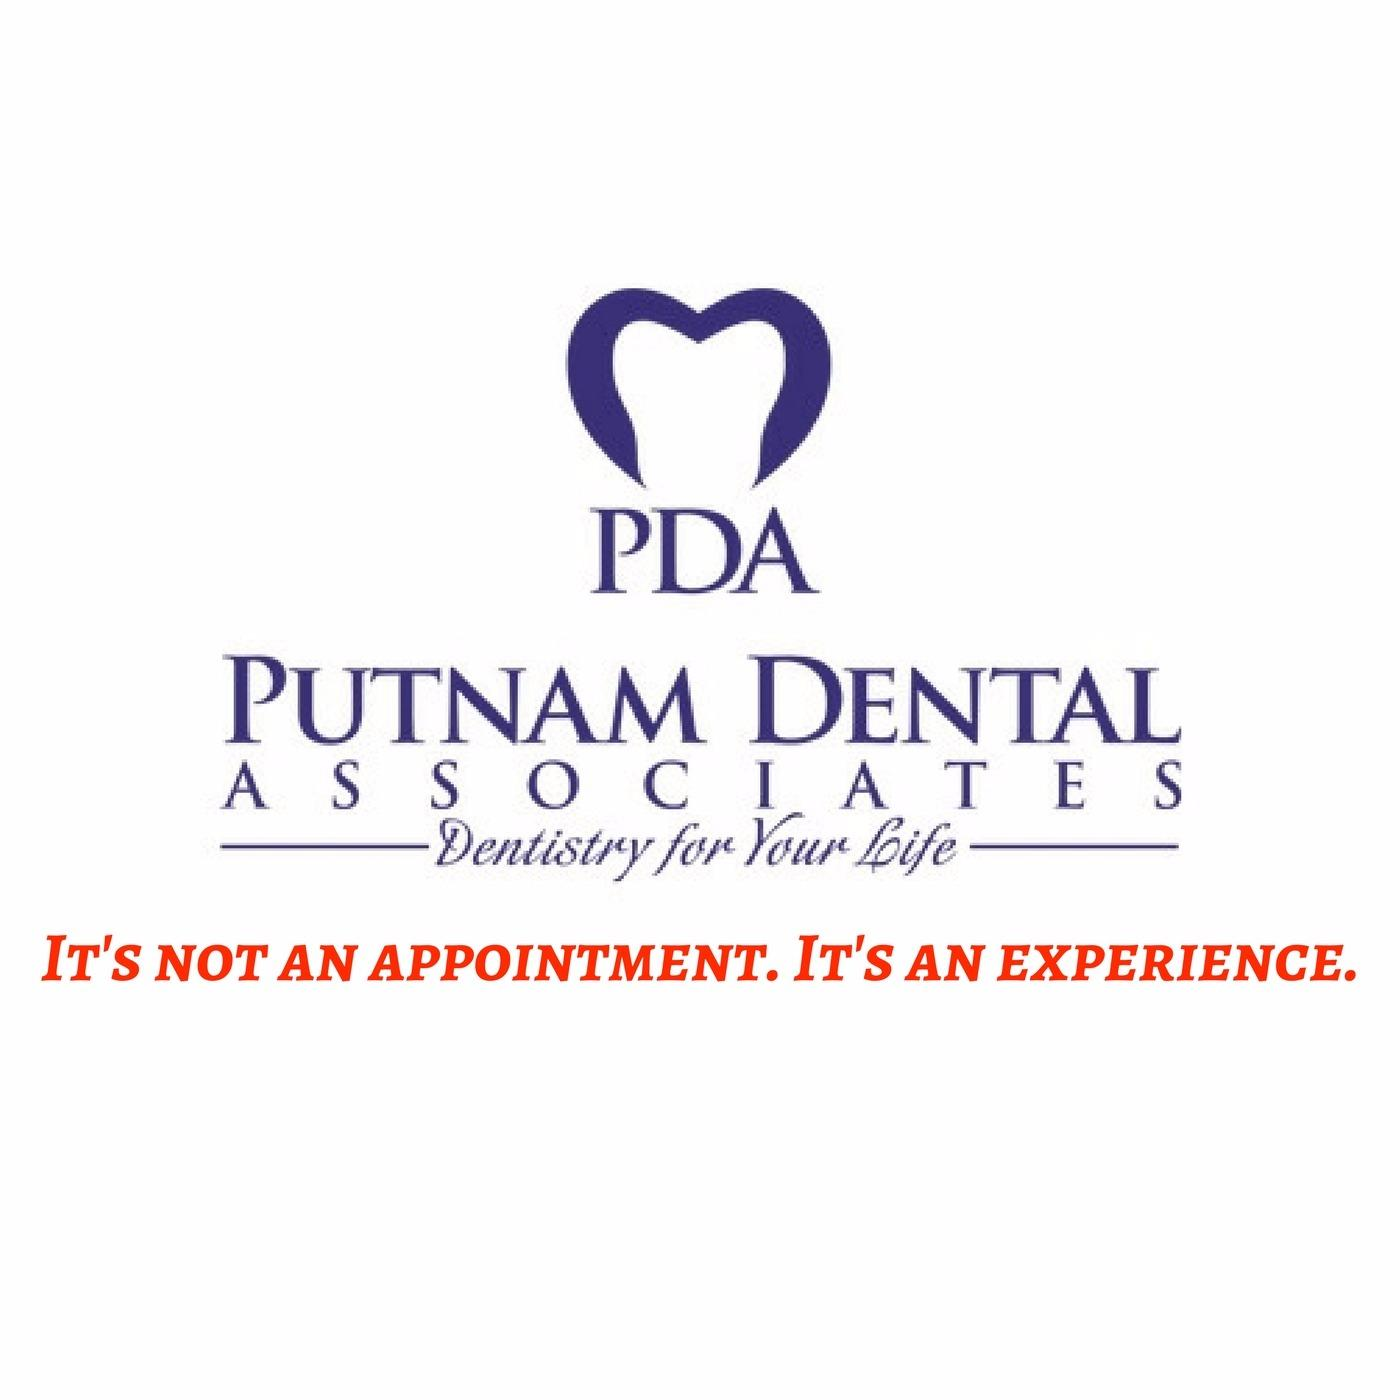 Putnam Dental Associates